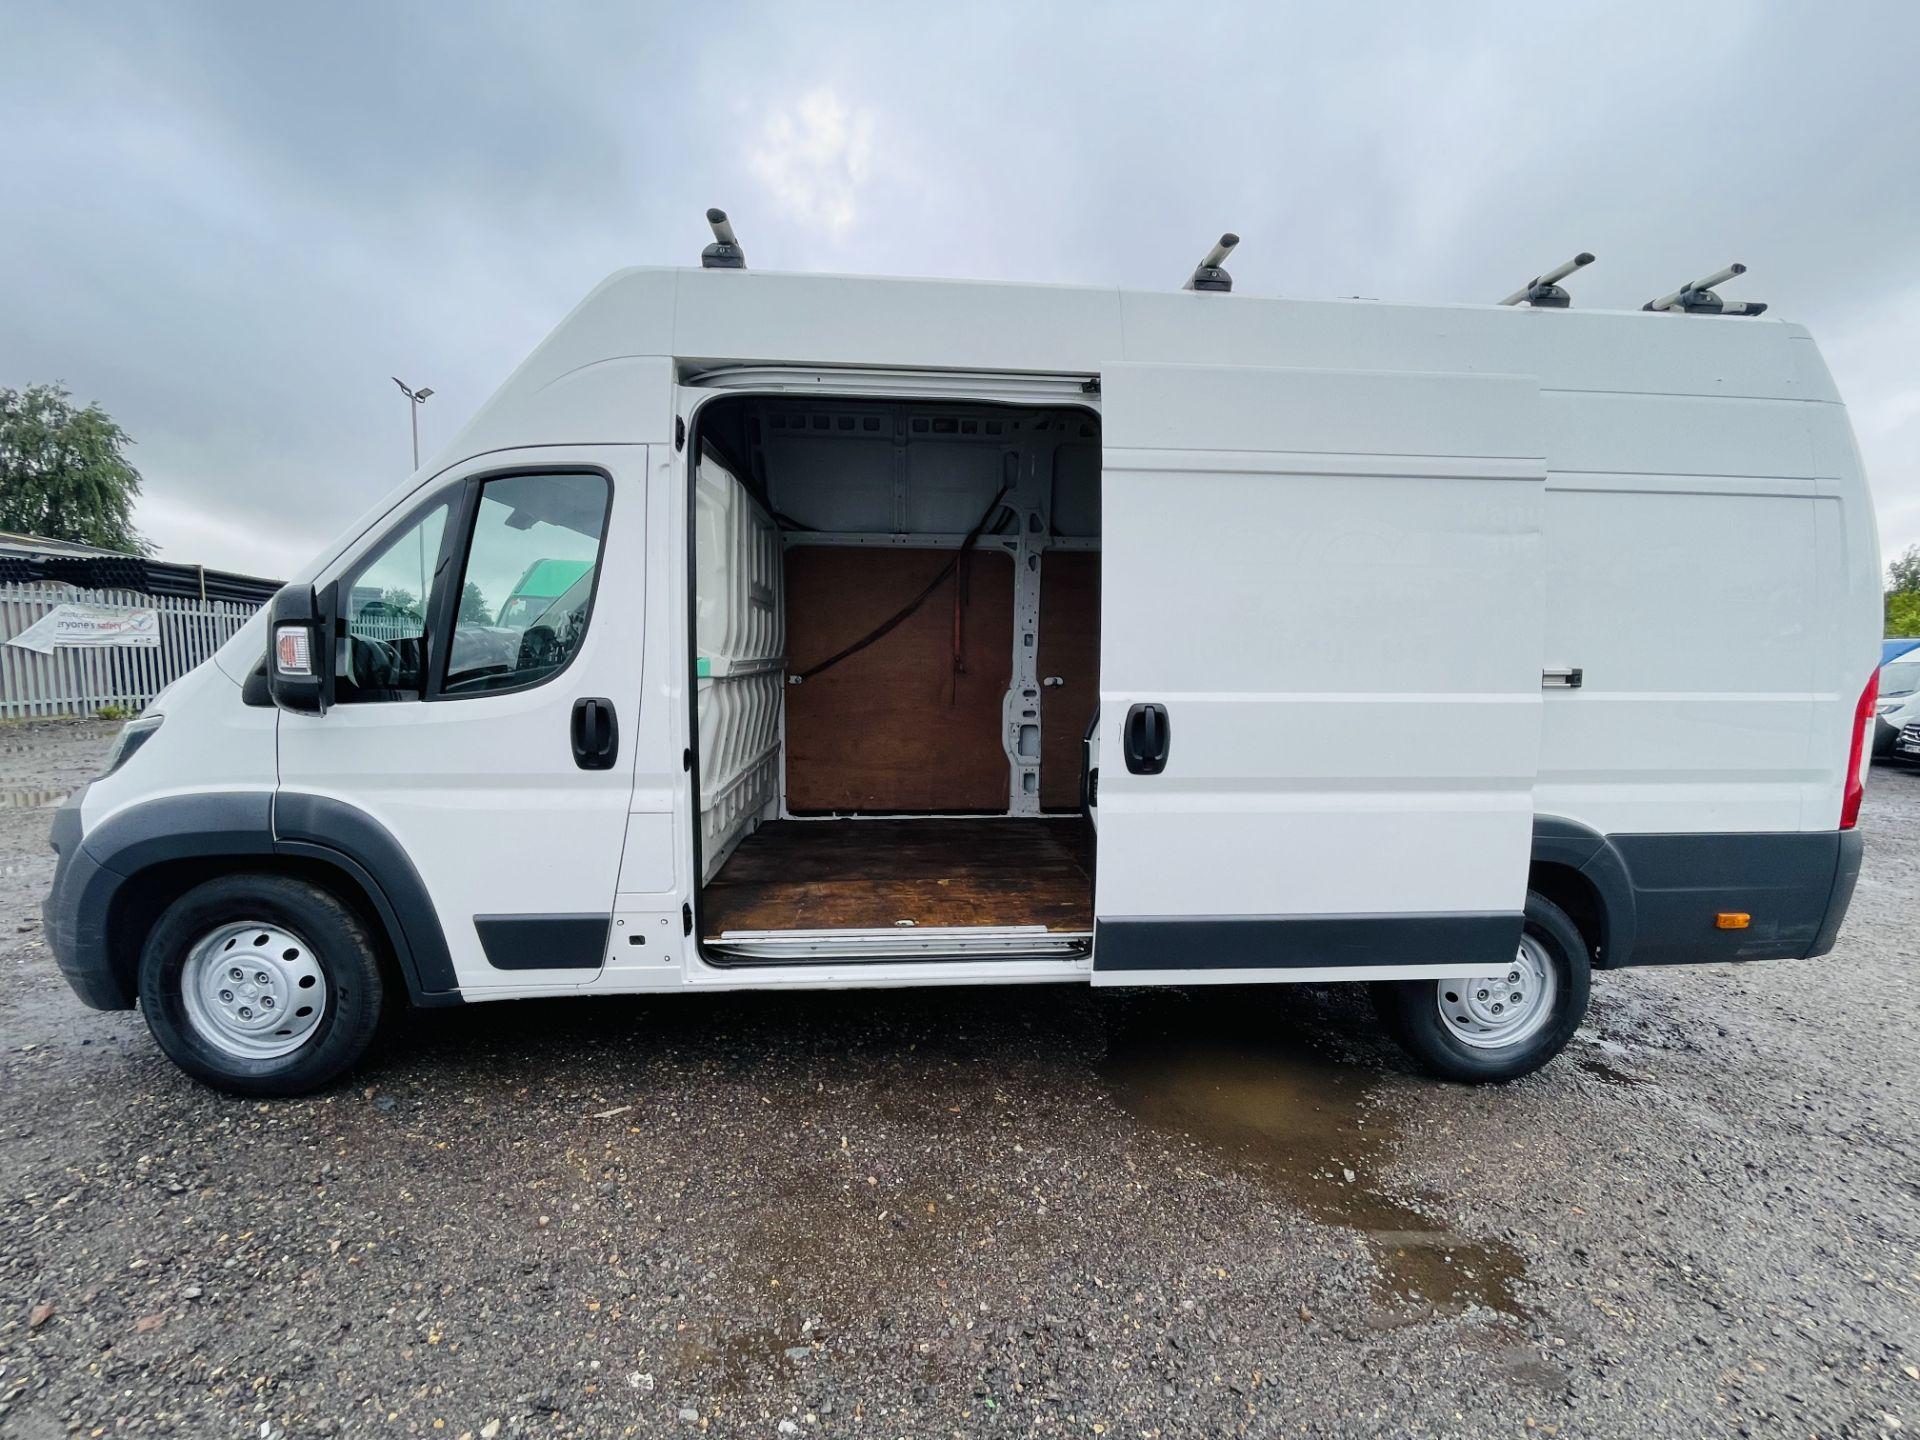 ** ON SALE ** Peugeot Boxer 2.0 BlueHDI L4 H3 2017 '66 Reg' Panel Van - LCV - Euro 6b ULEZ Compliant - Image 9 of 18